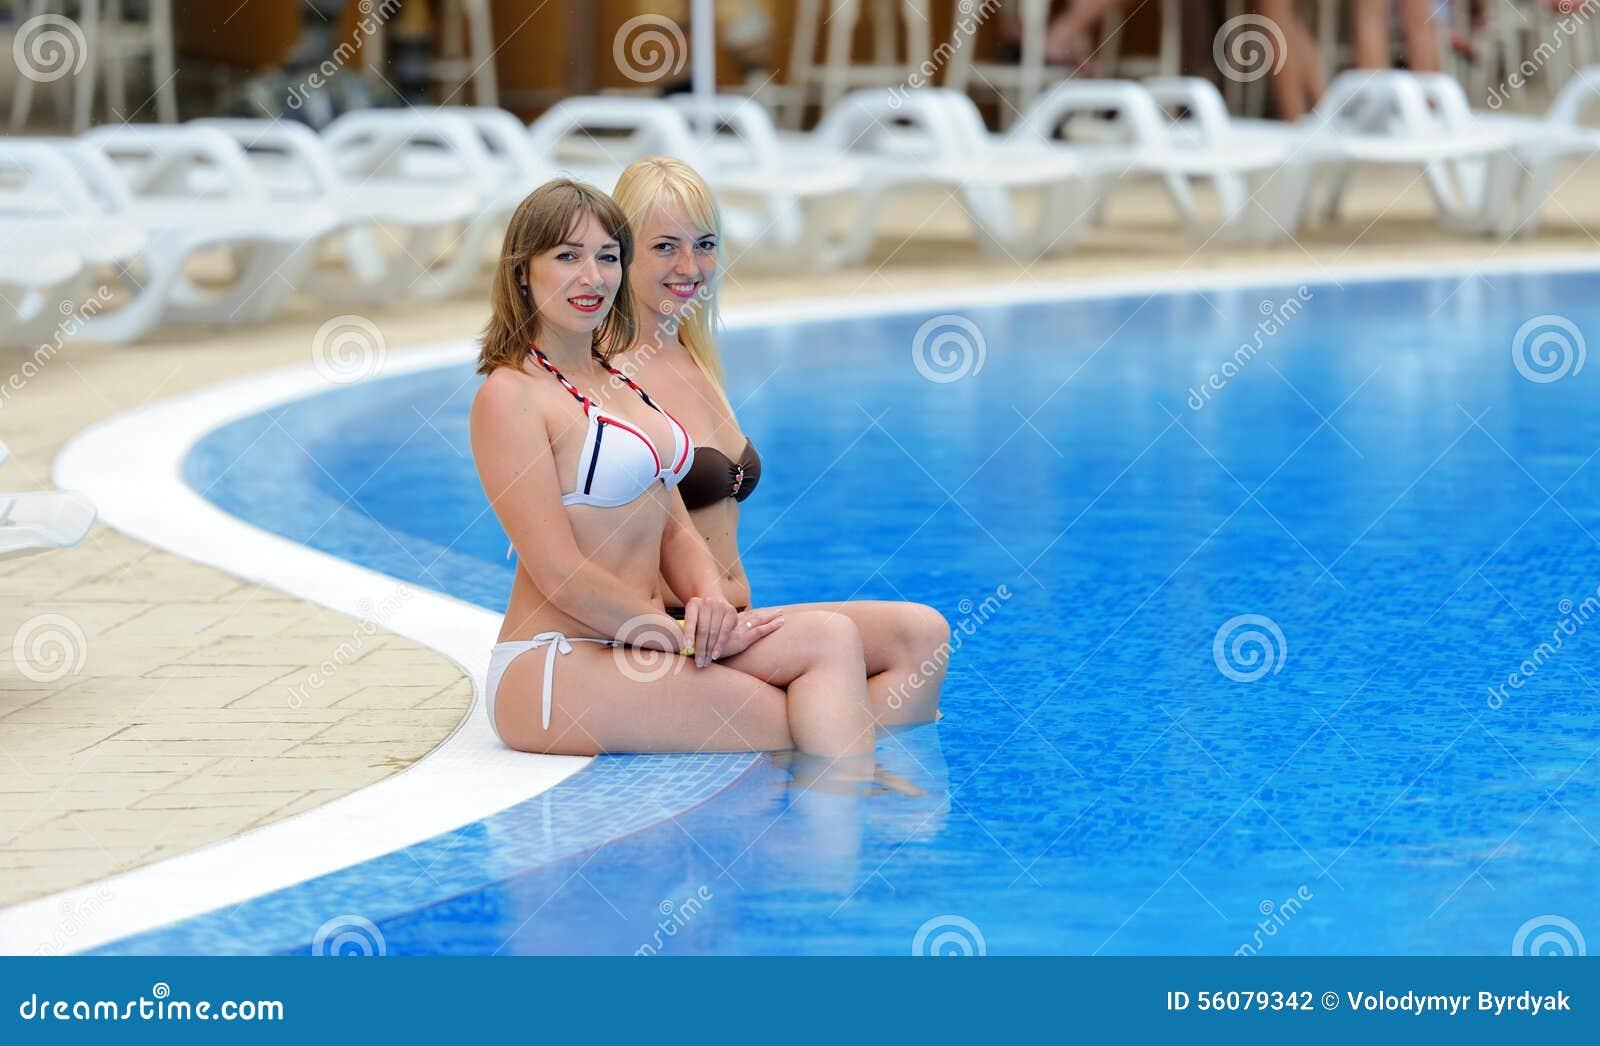 photos of nudists family holidays